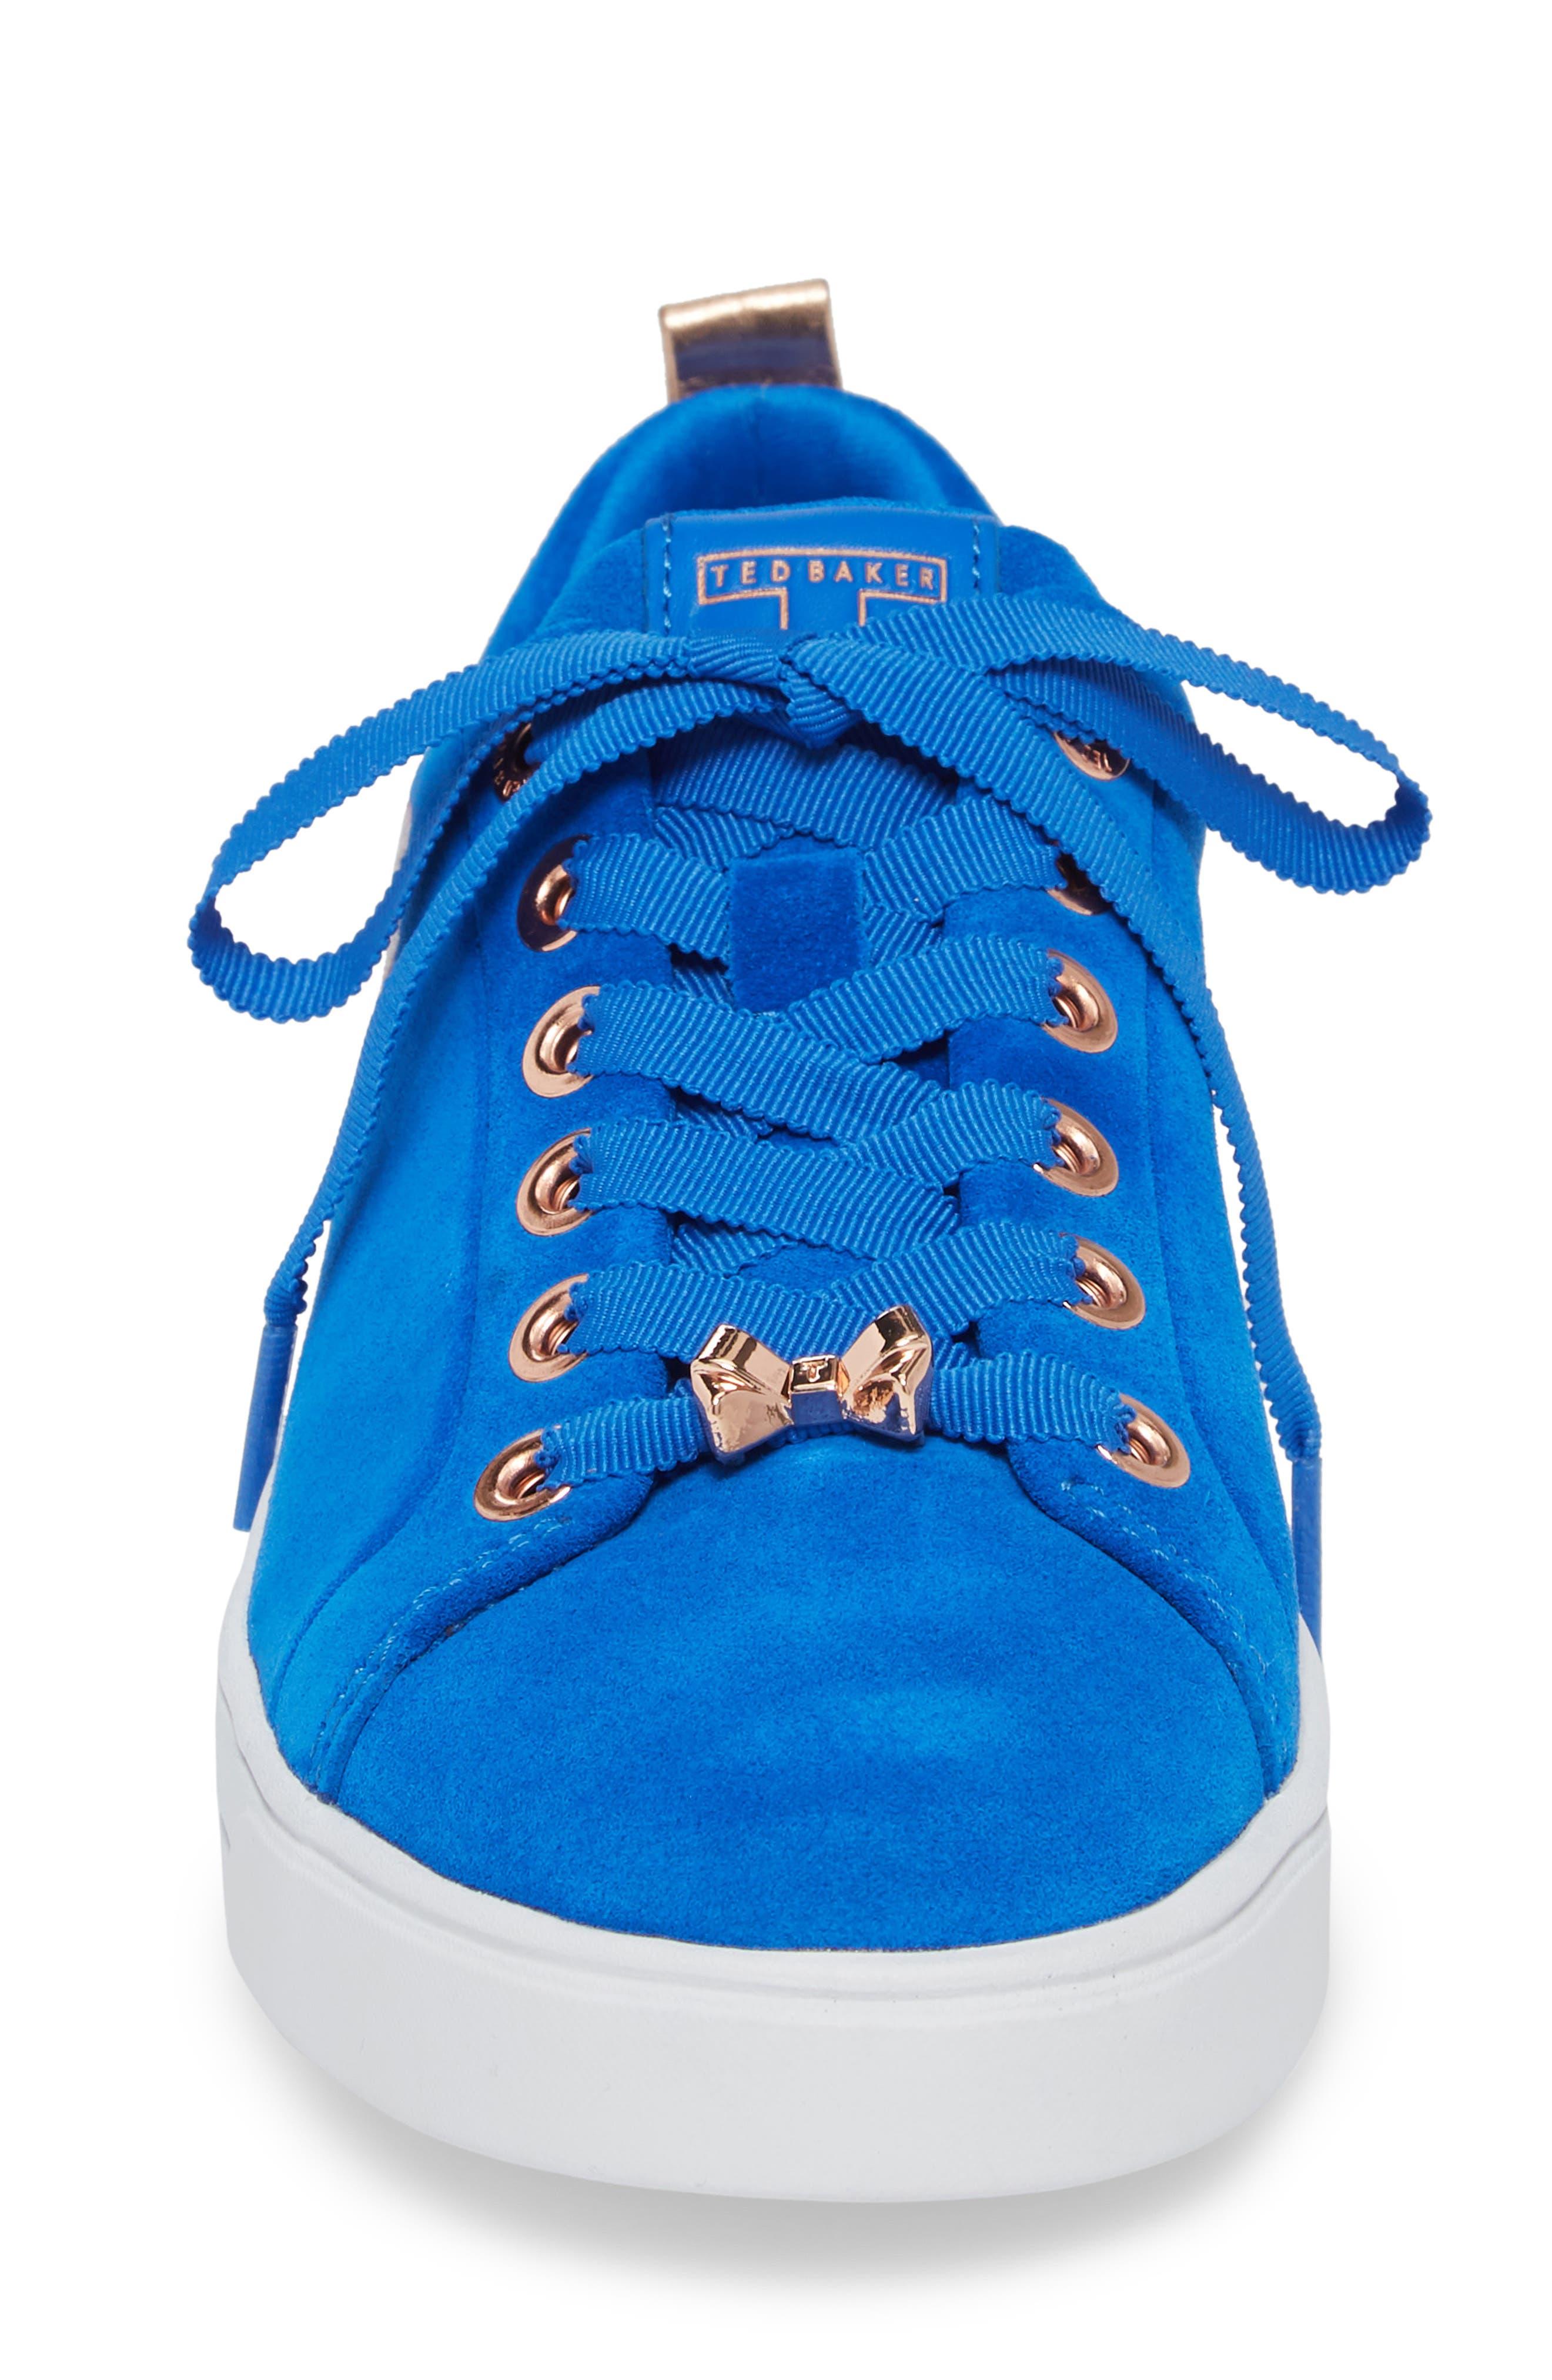 Eryin Sneaker,                             Alternate thumbnail 4, color,                             BLUE HARMONY PRINT SUEDE